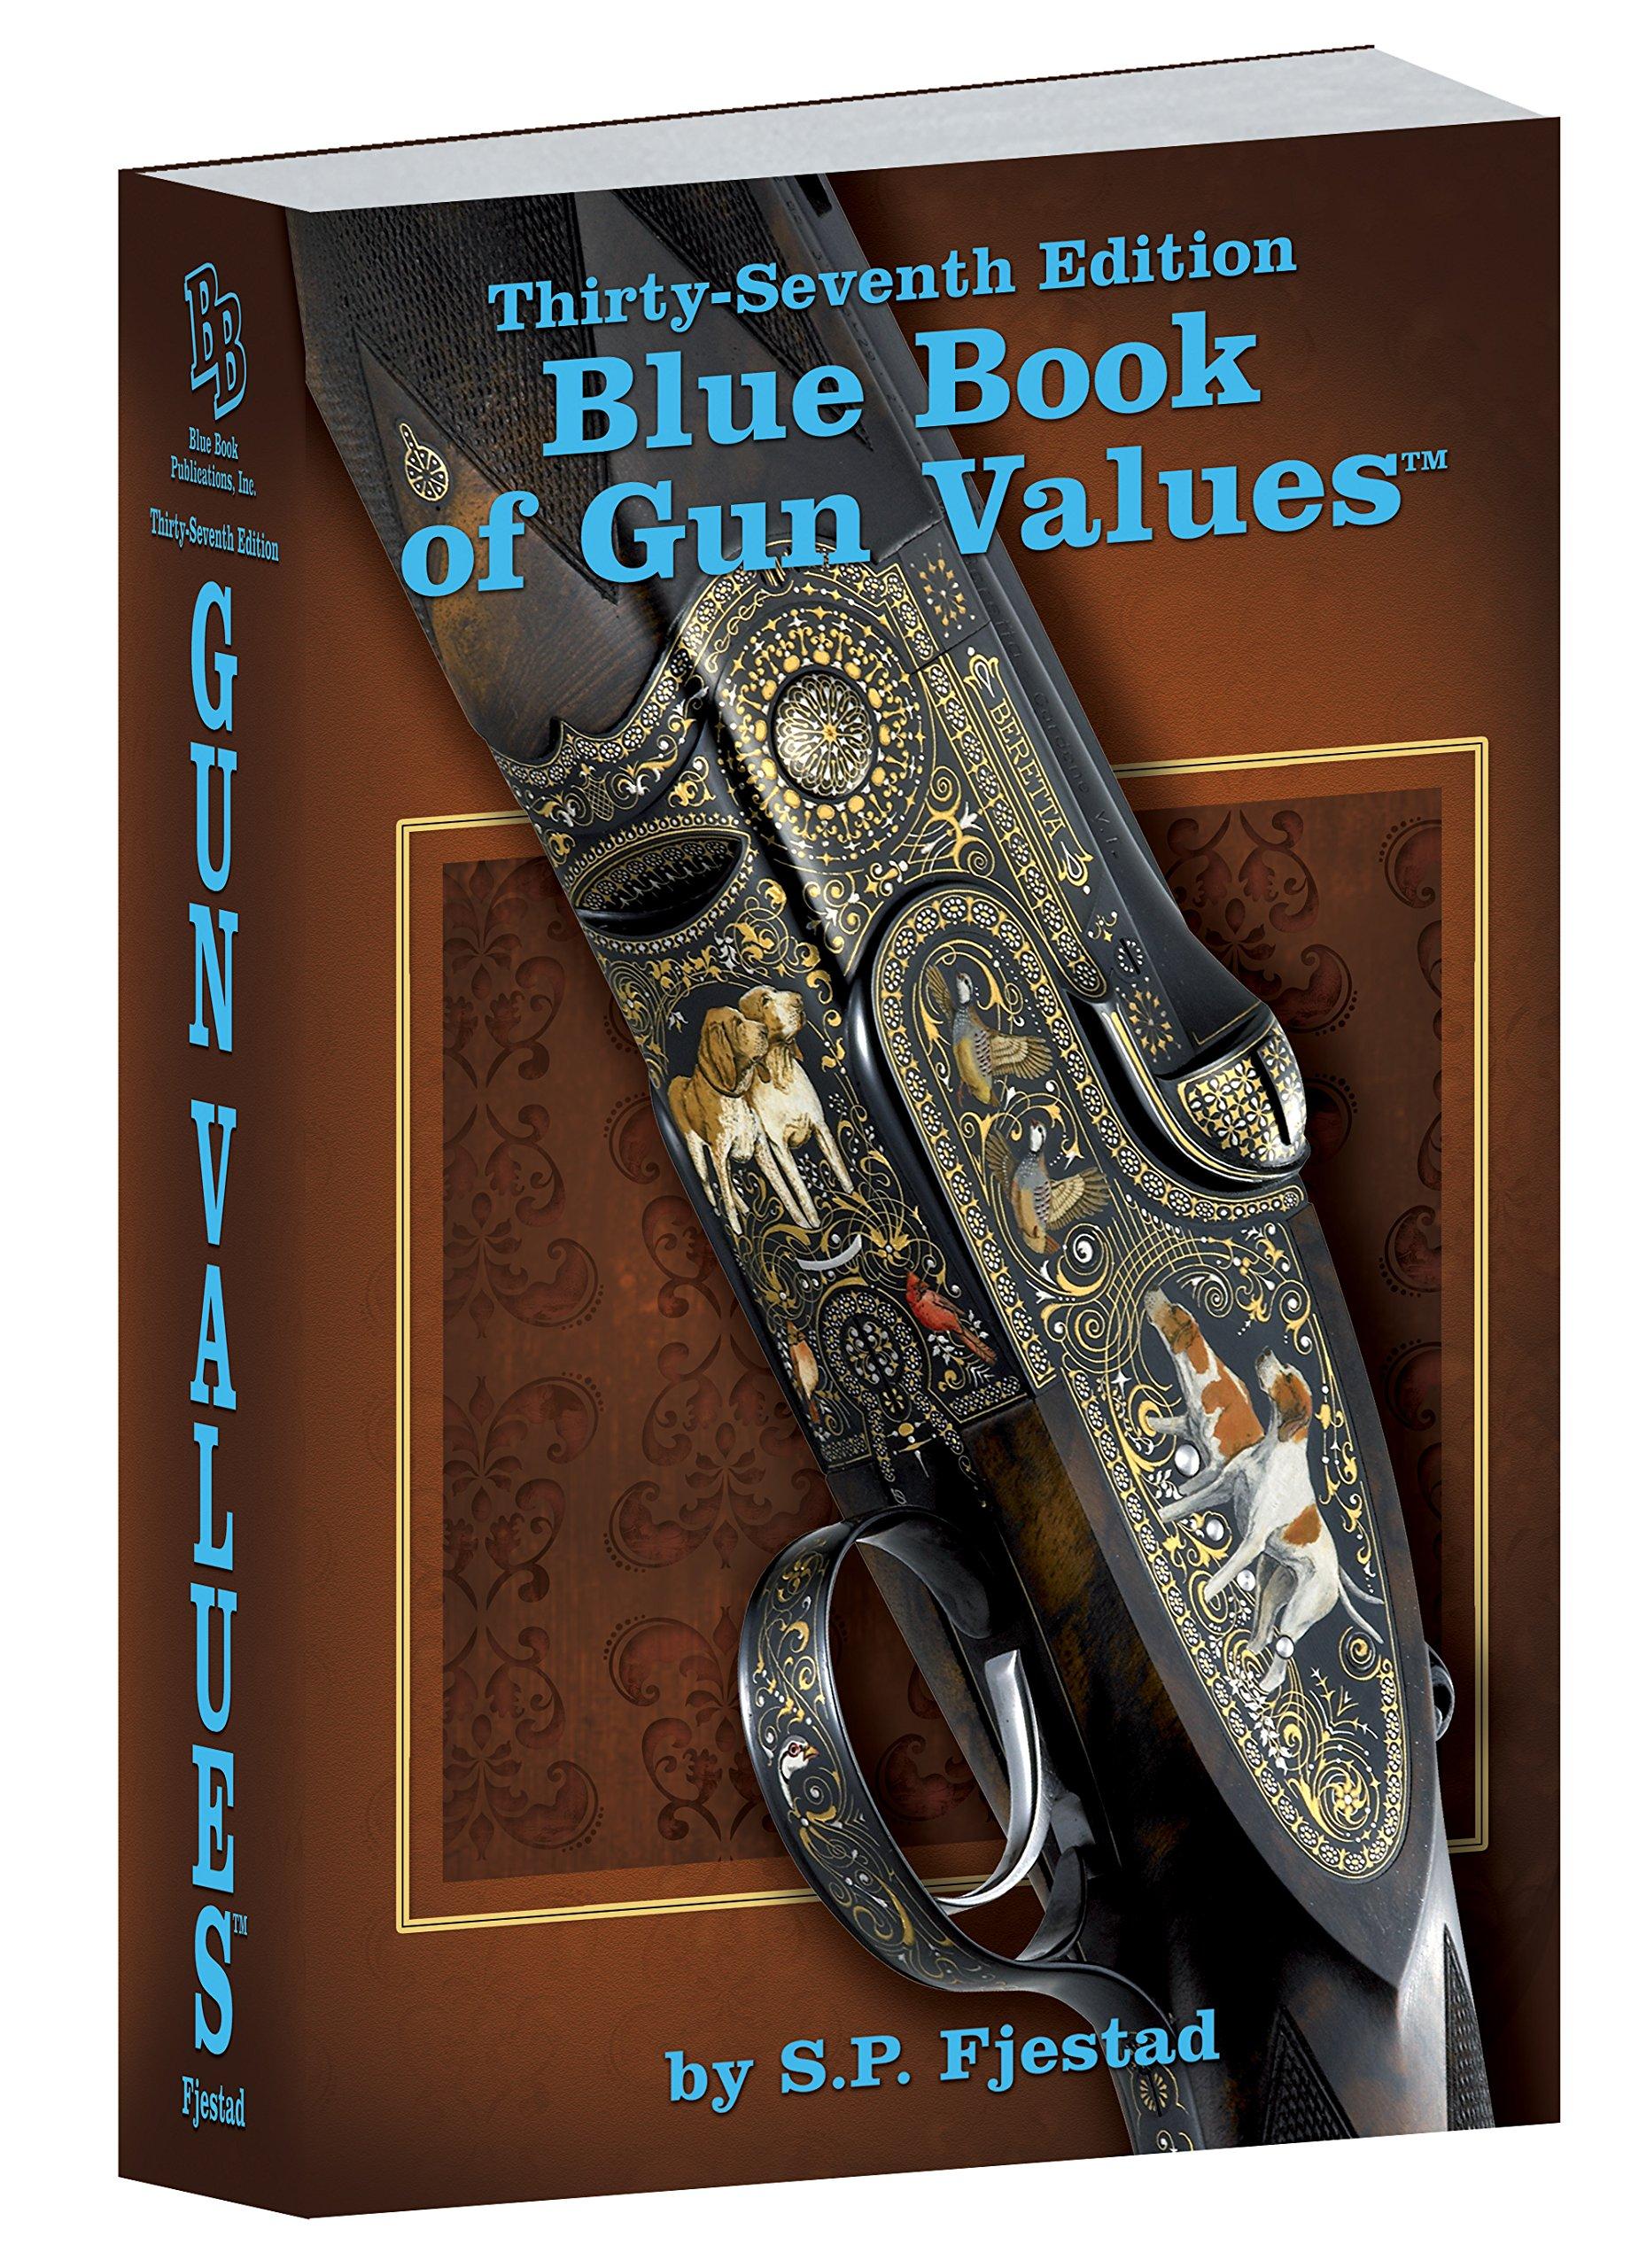 Amazon.com: Blue Book of Gun Values (9781936120758): Steven P ...